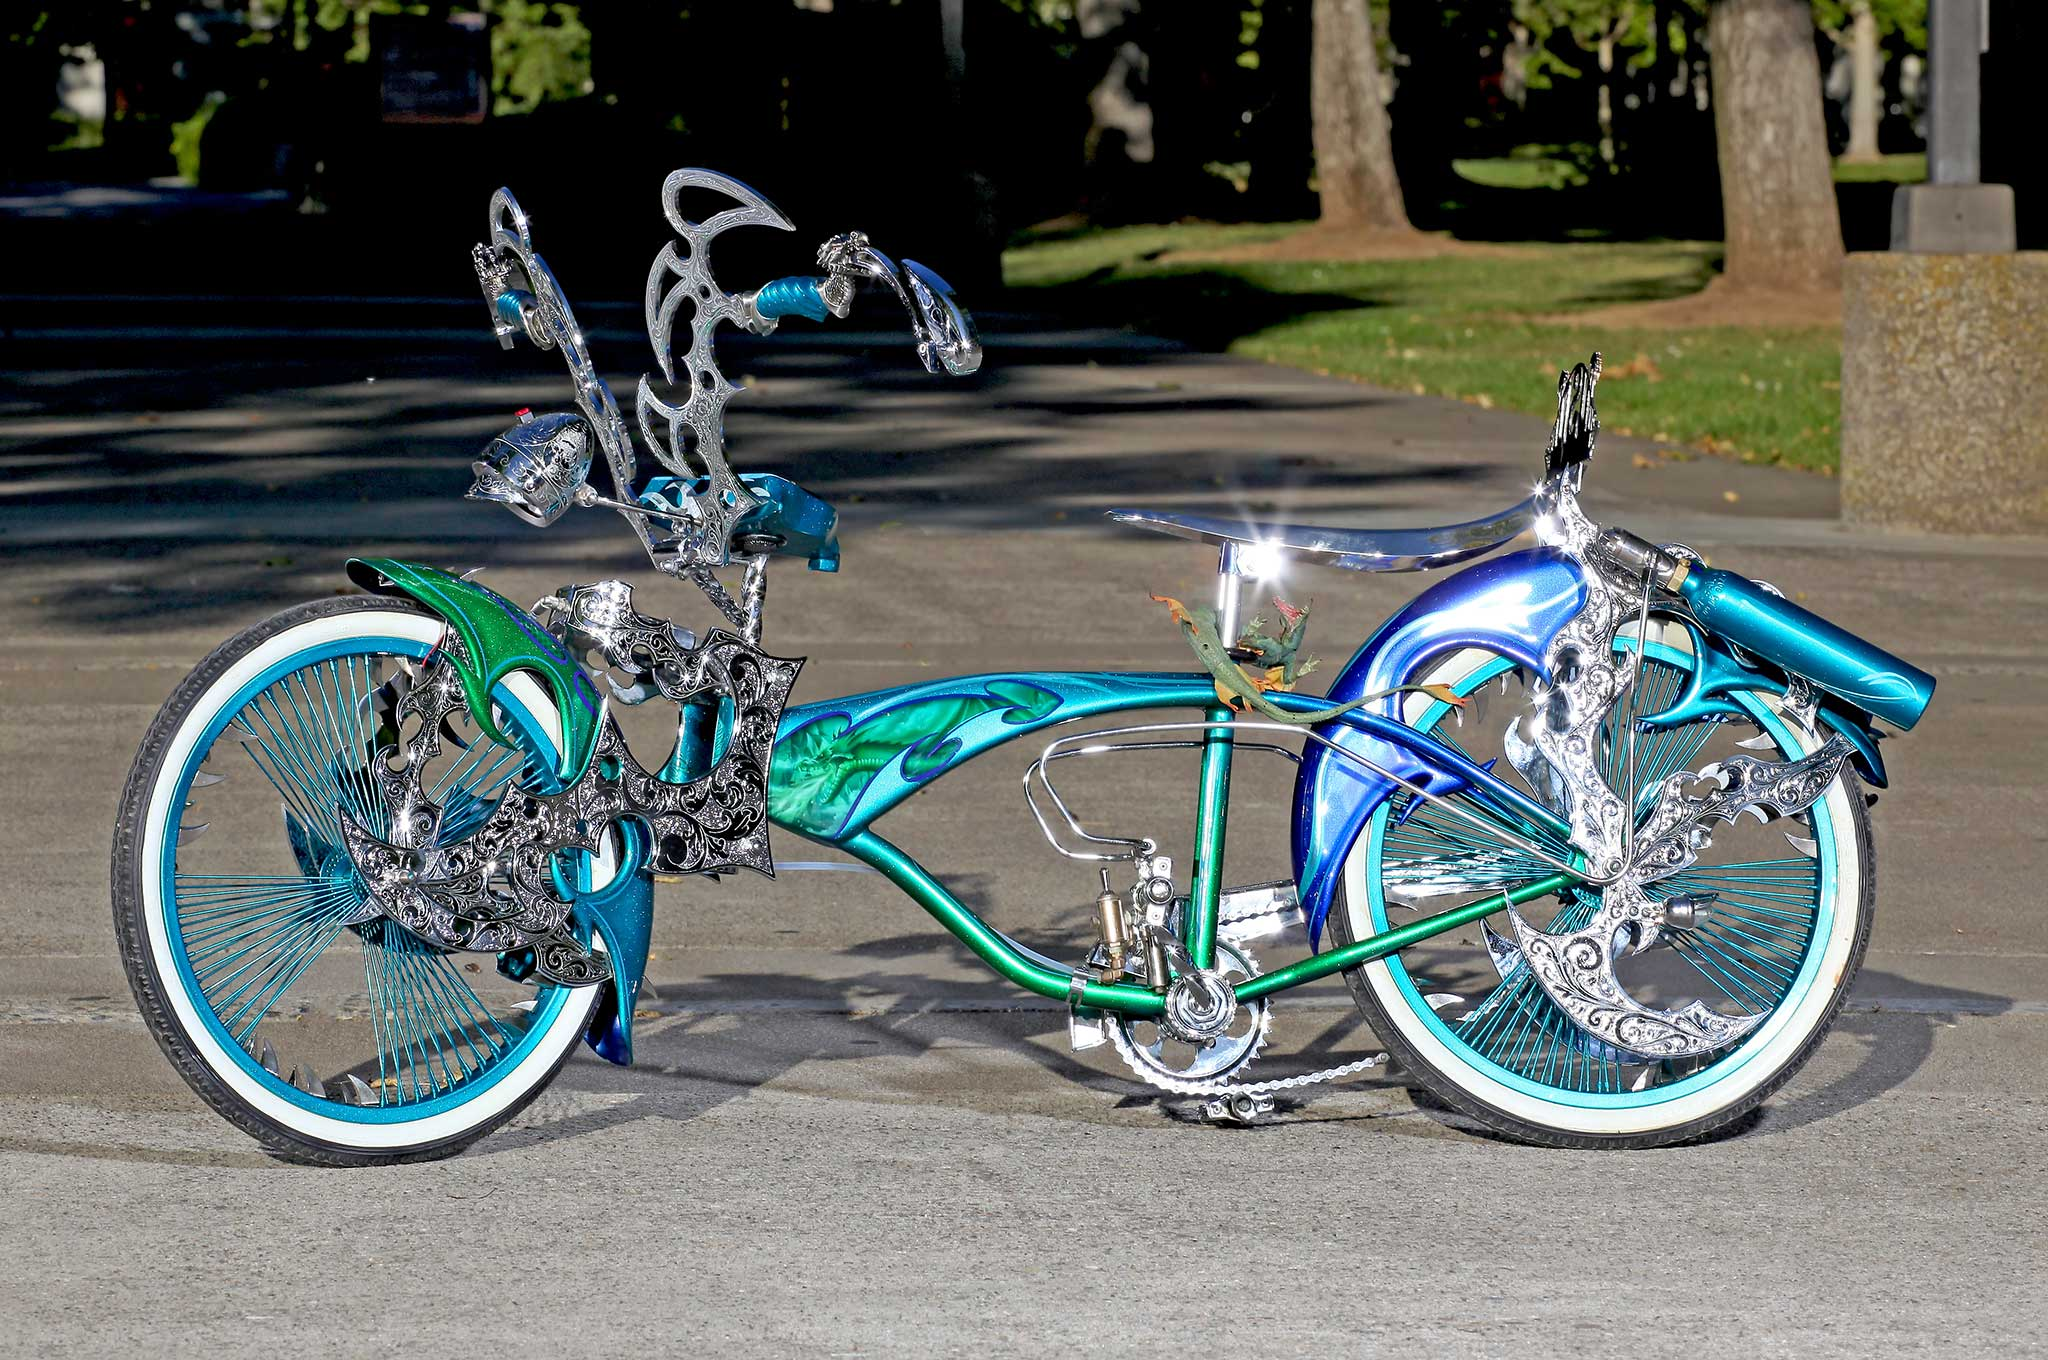 2000-aztlan-bike-side-view-014.jpg